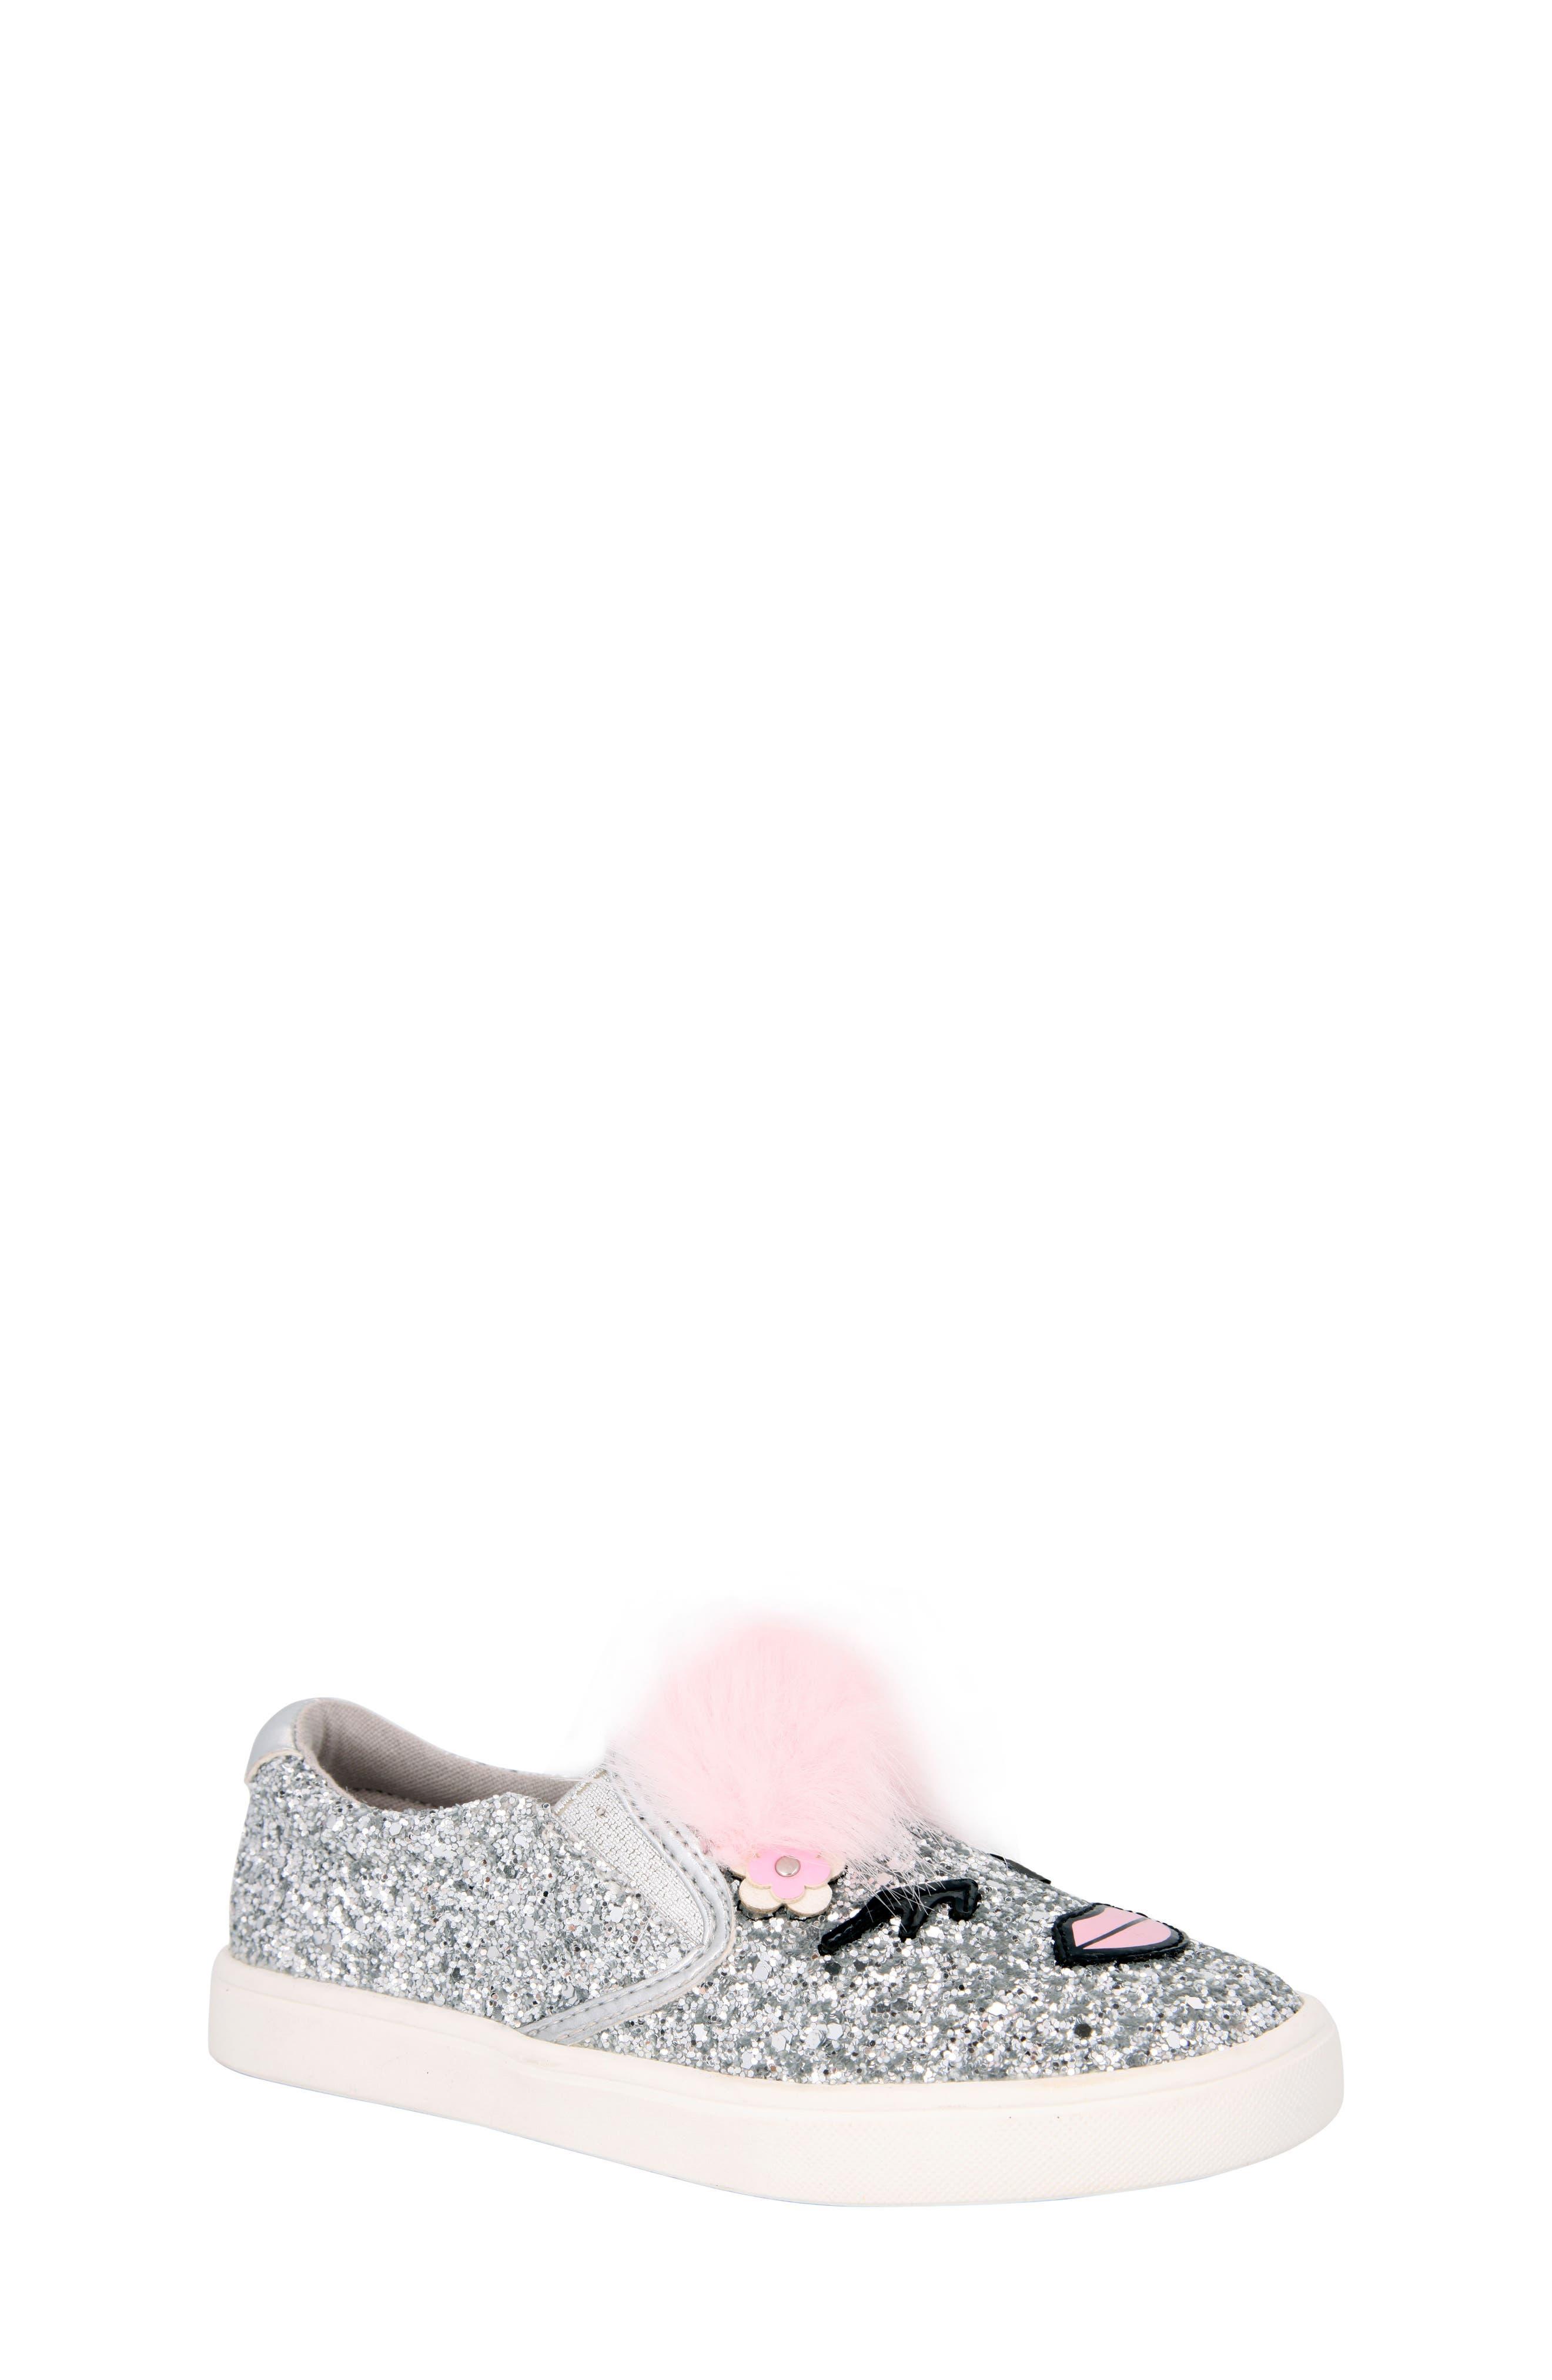 Alternate Image 1 Selected - Nina Ragina Faux Fur Slip-On Sneaker (Little Kid & Big Kid)